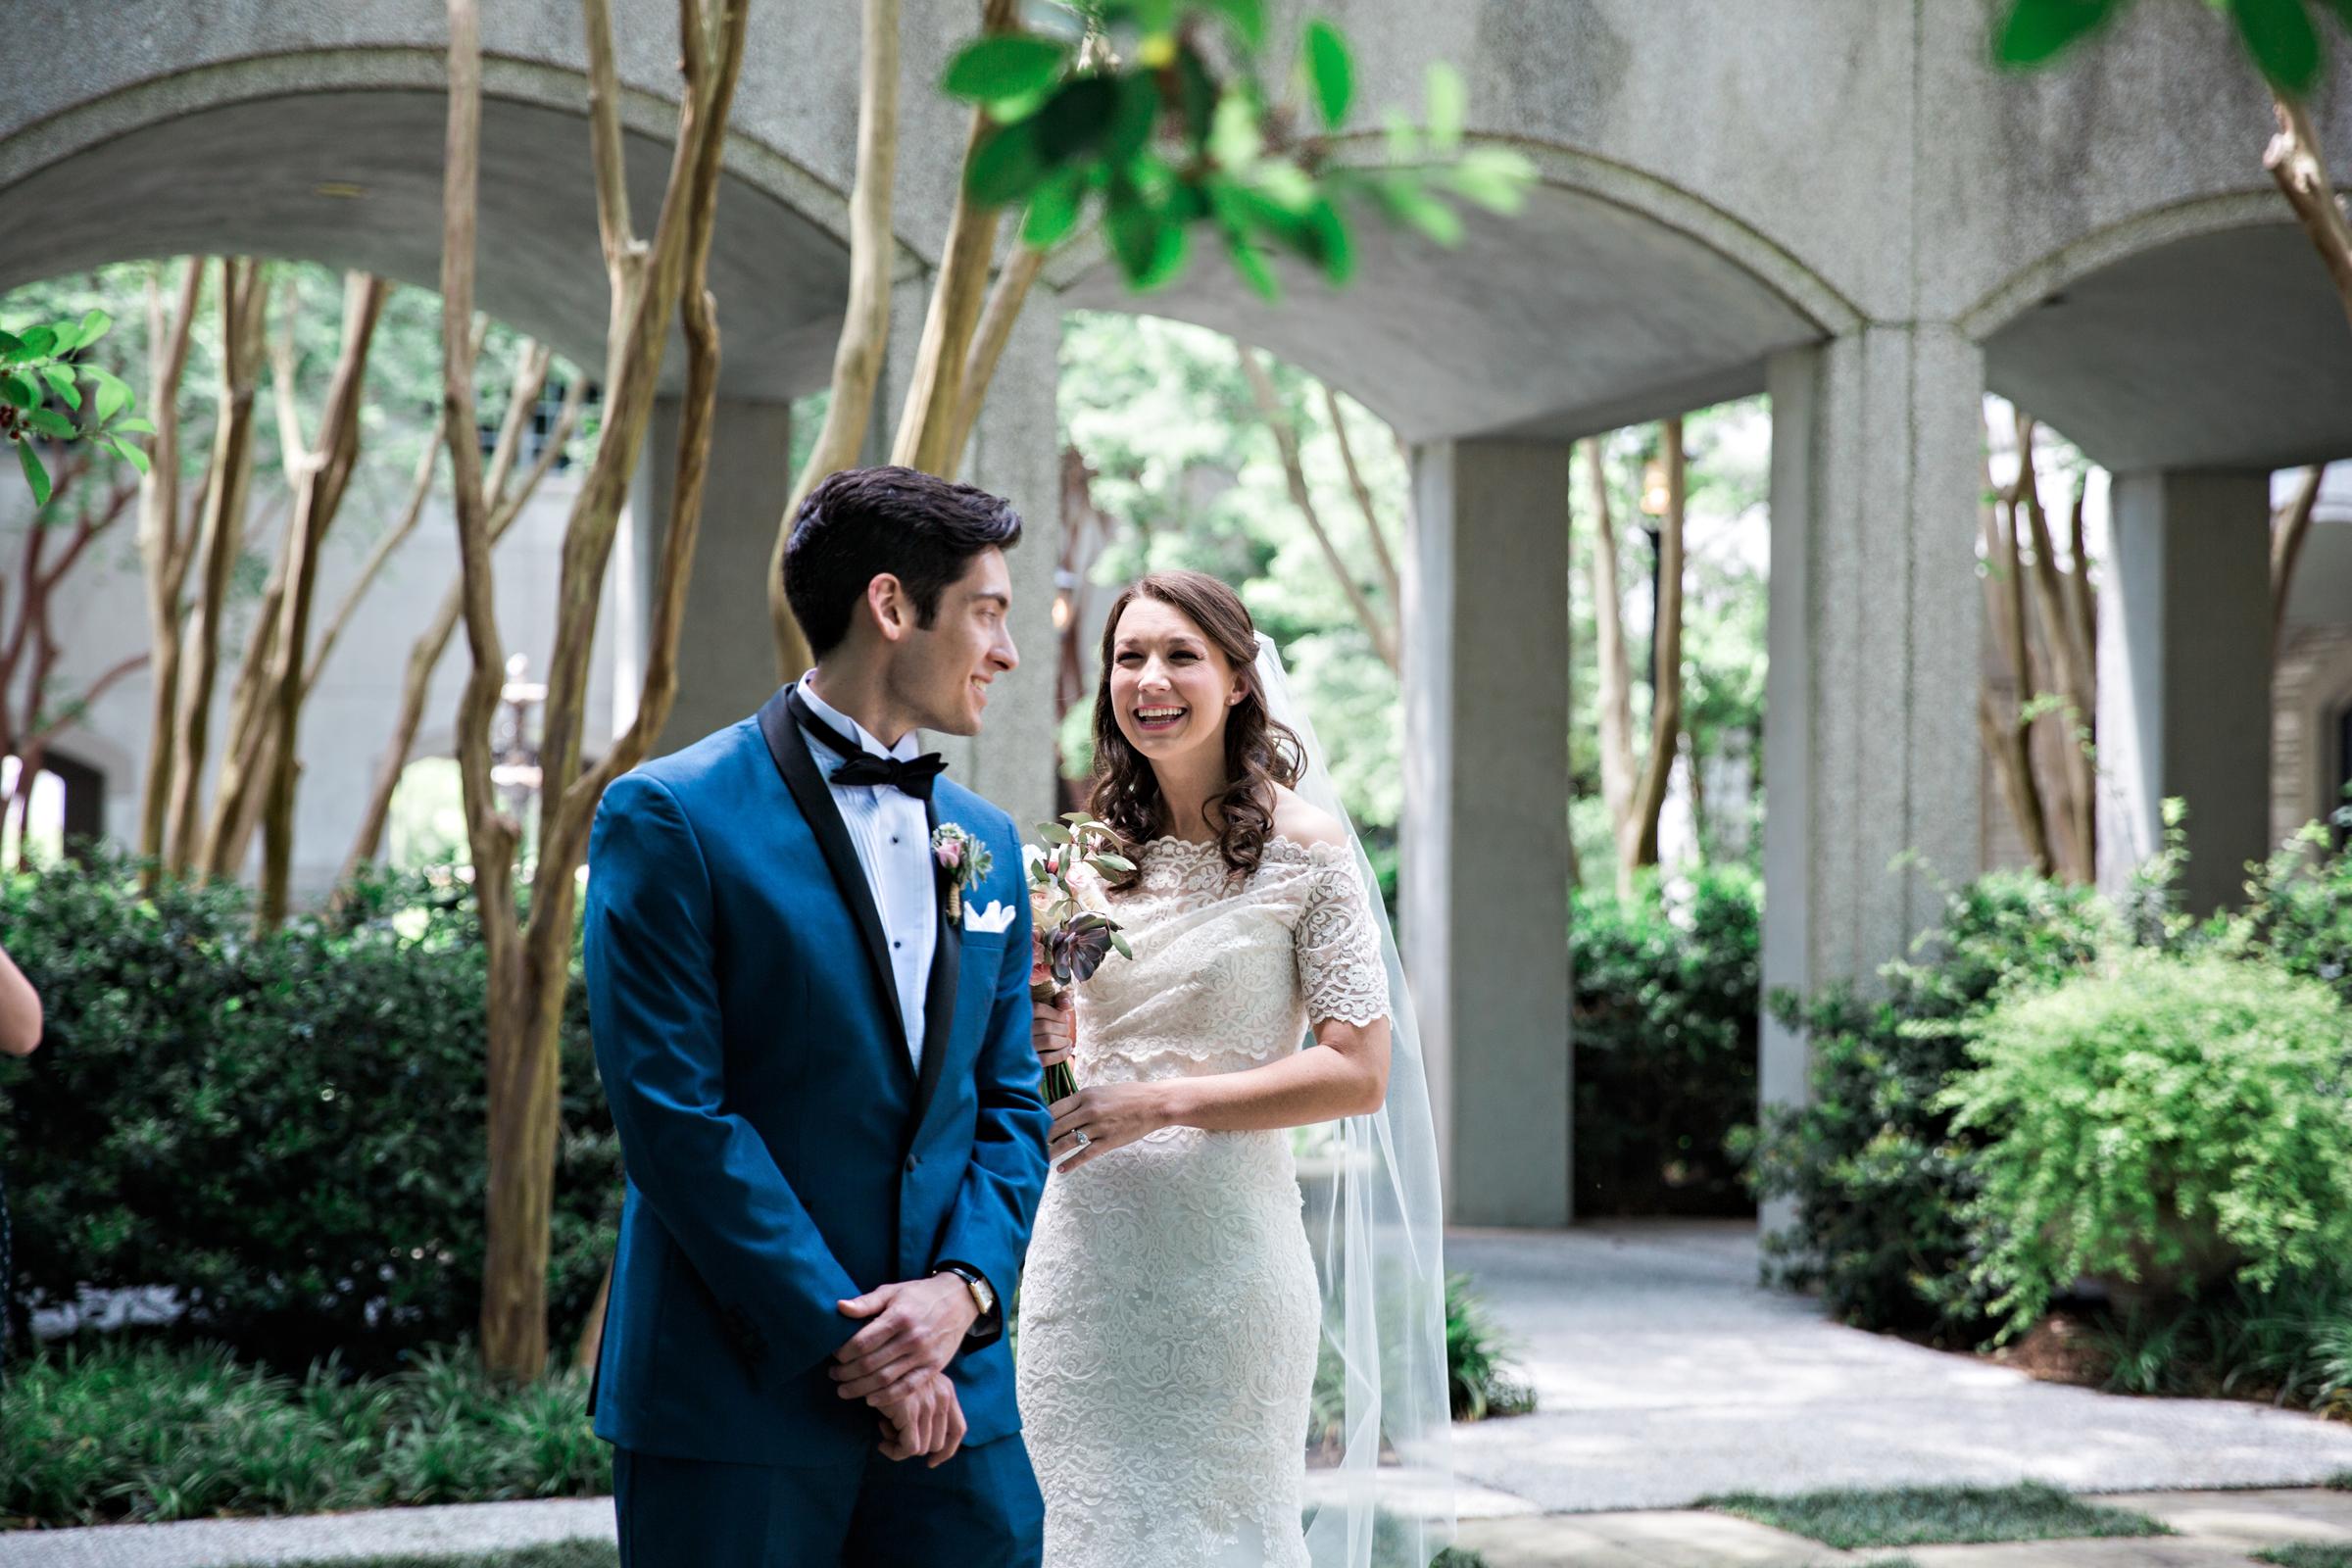 Ni ck-Drollette-Photography-Montgomery-Alabama-Weddings-122.jpg